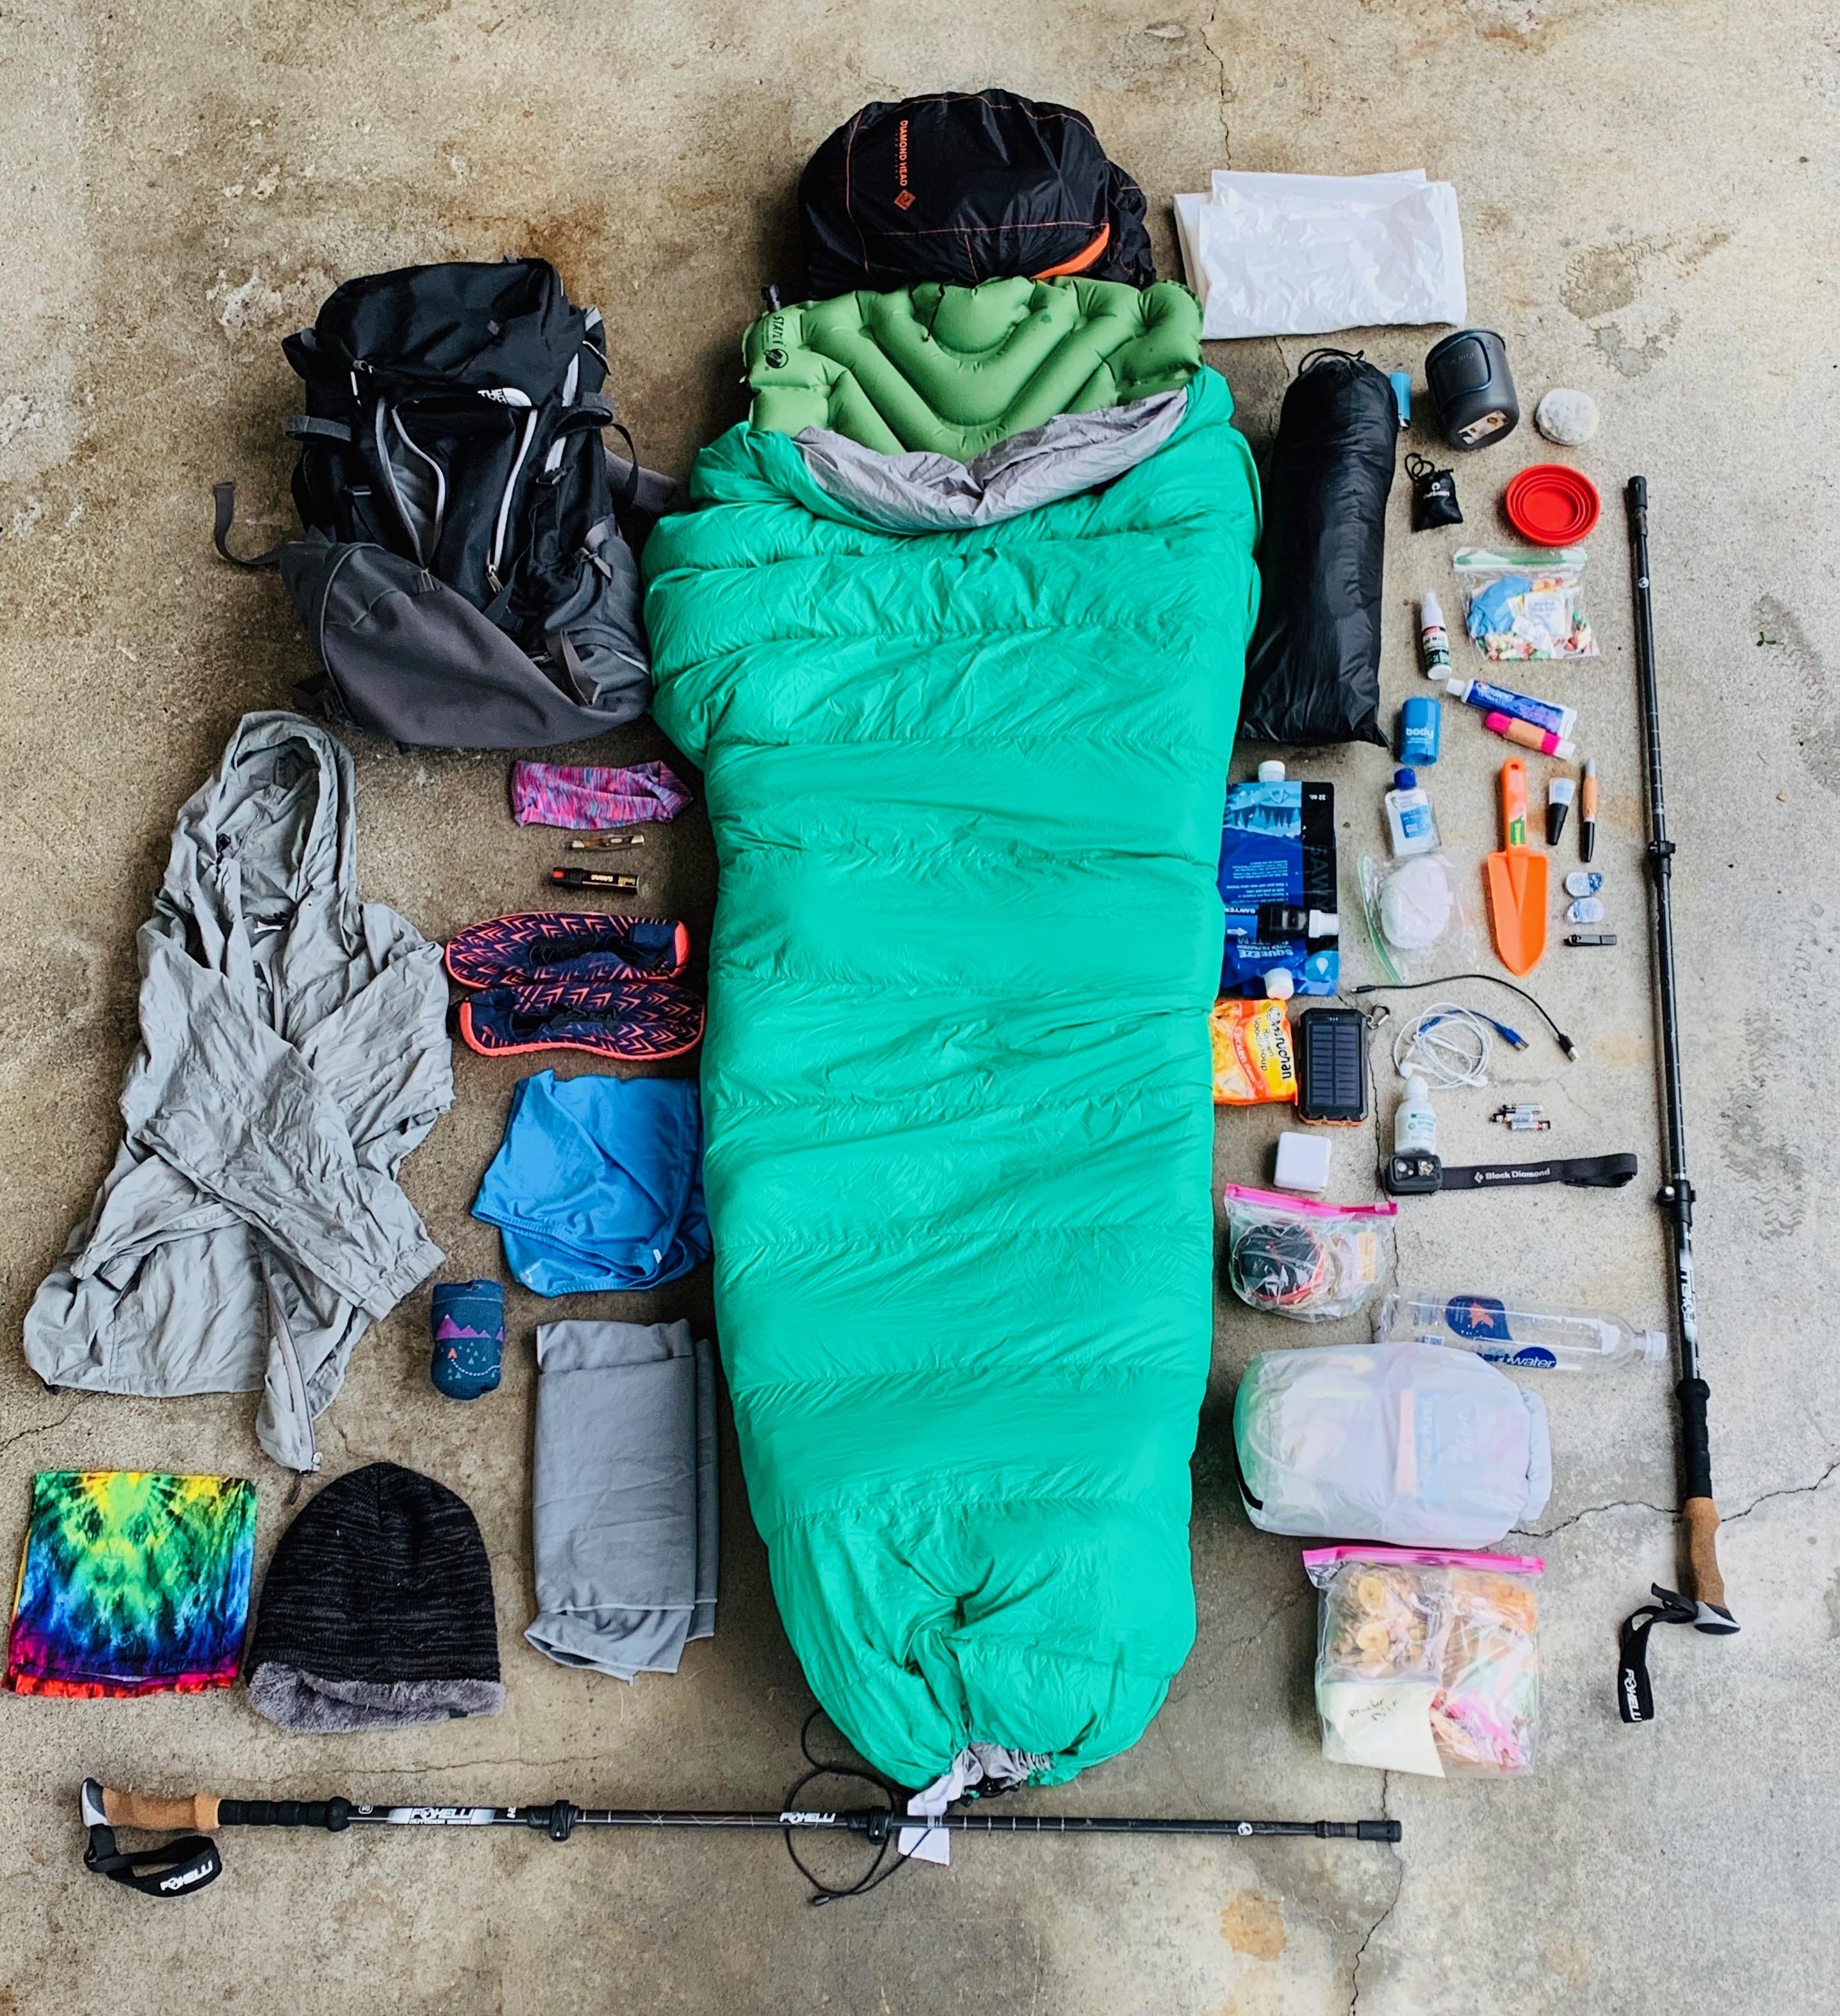 Marie Kondo: Backpacker edition - The Trek